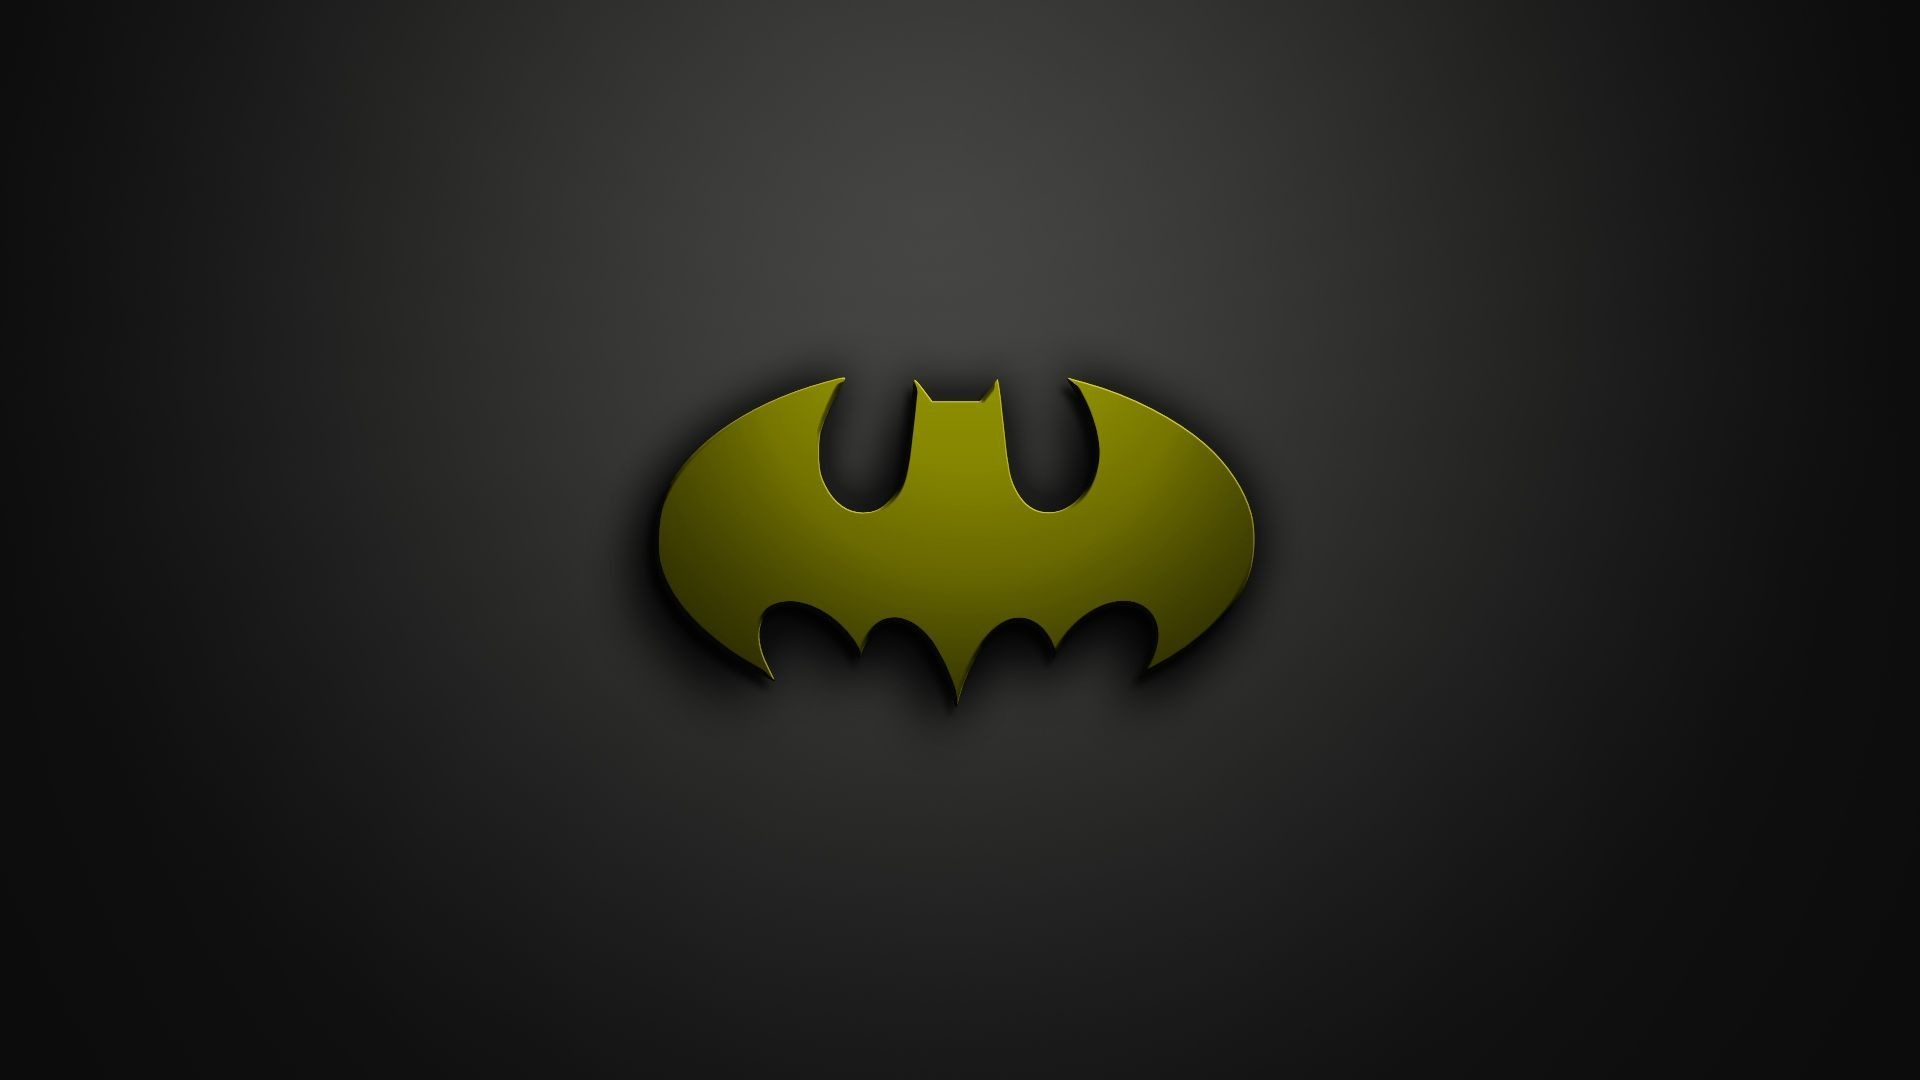 batman-logo-wallpaper-for-desktop-1080p-118.jpg